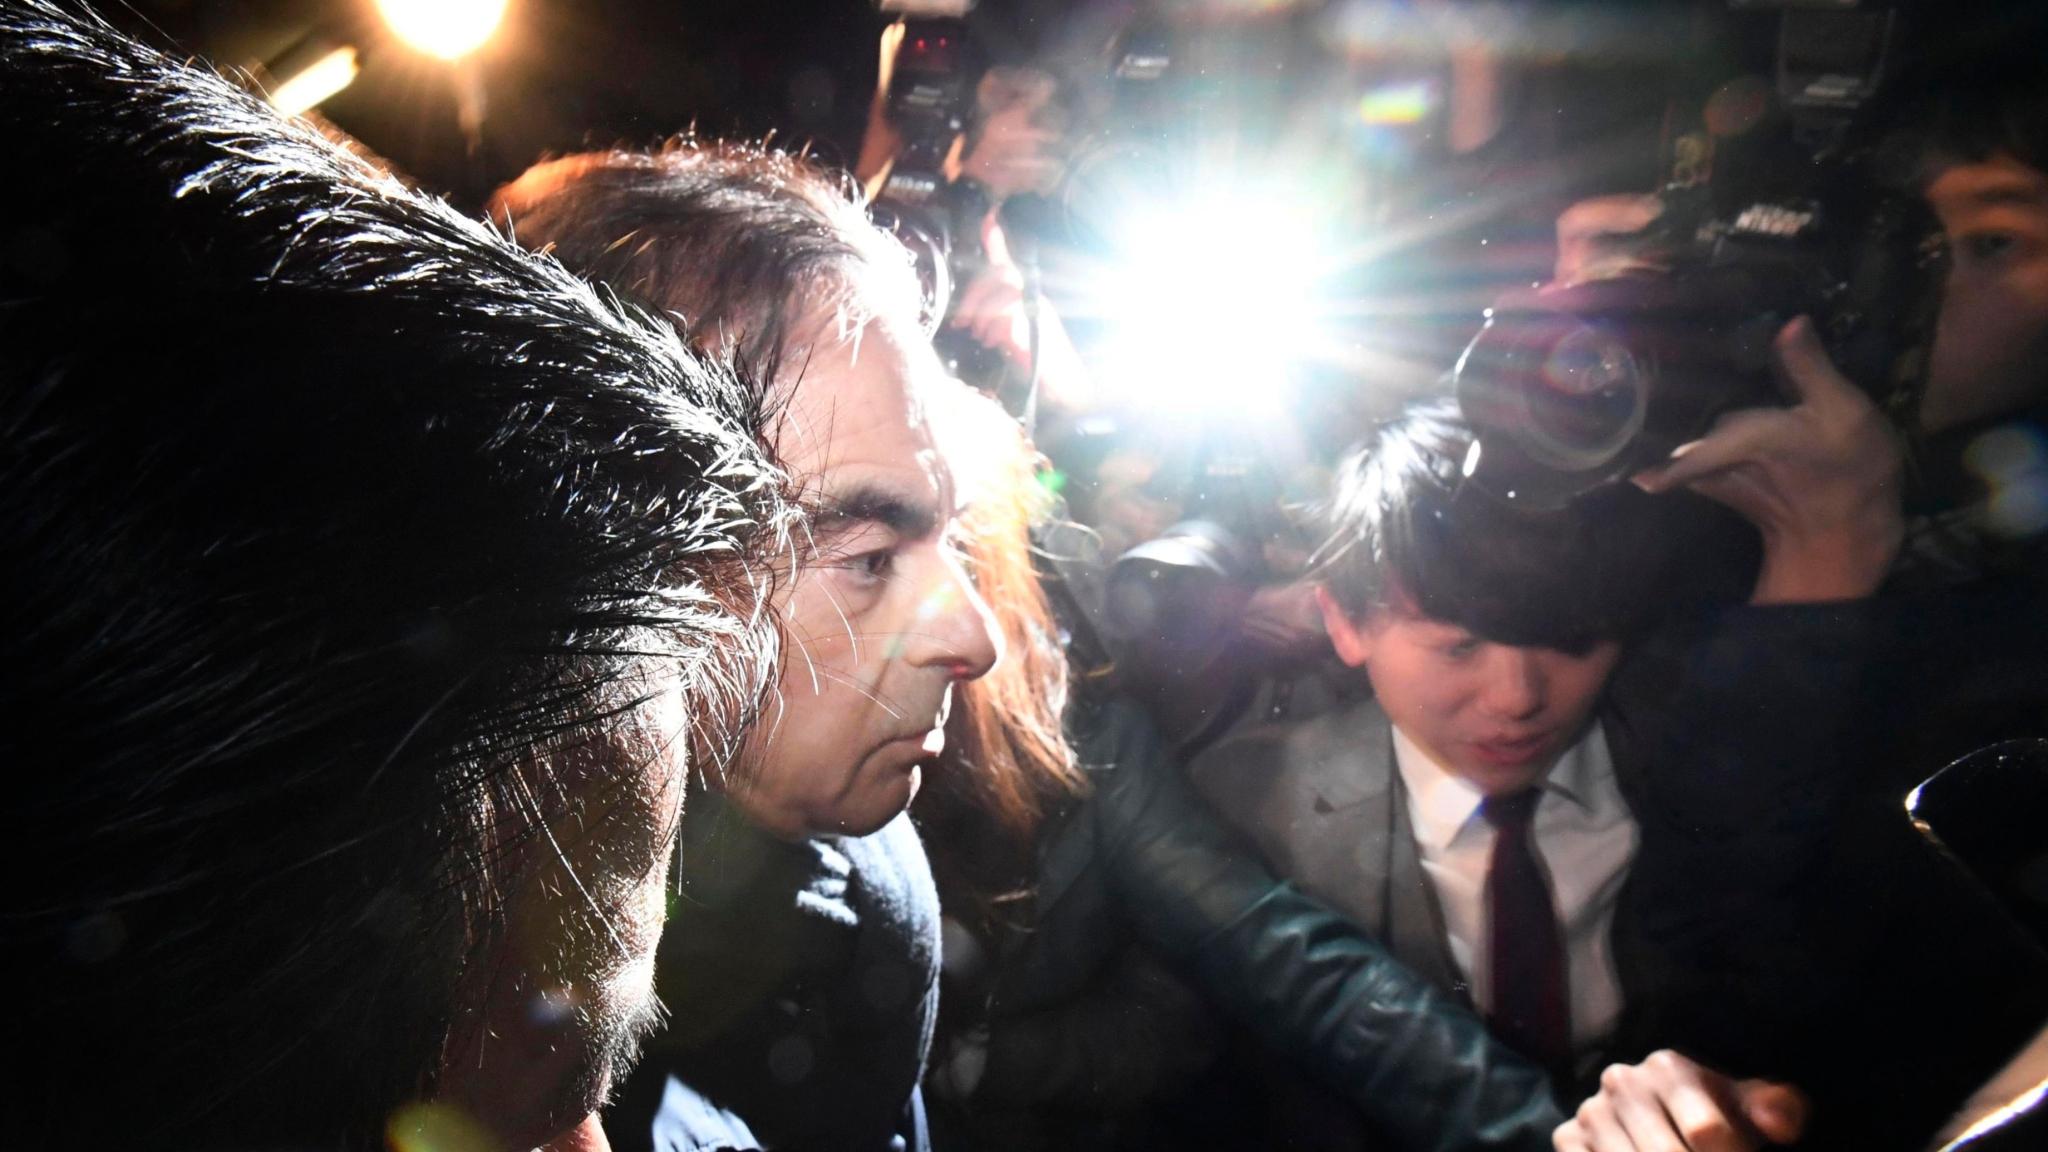 Japan Court Grants $4.5 Mn Bail to Nissan Ex-Chair Carlos Ghosn